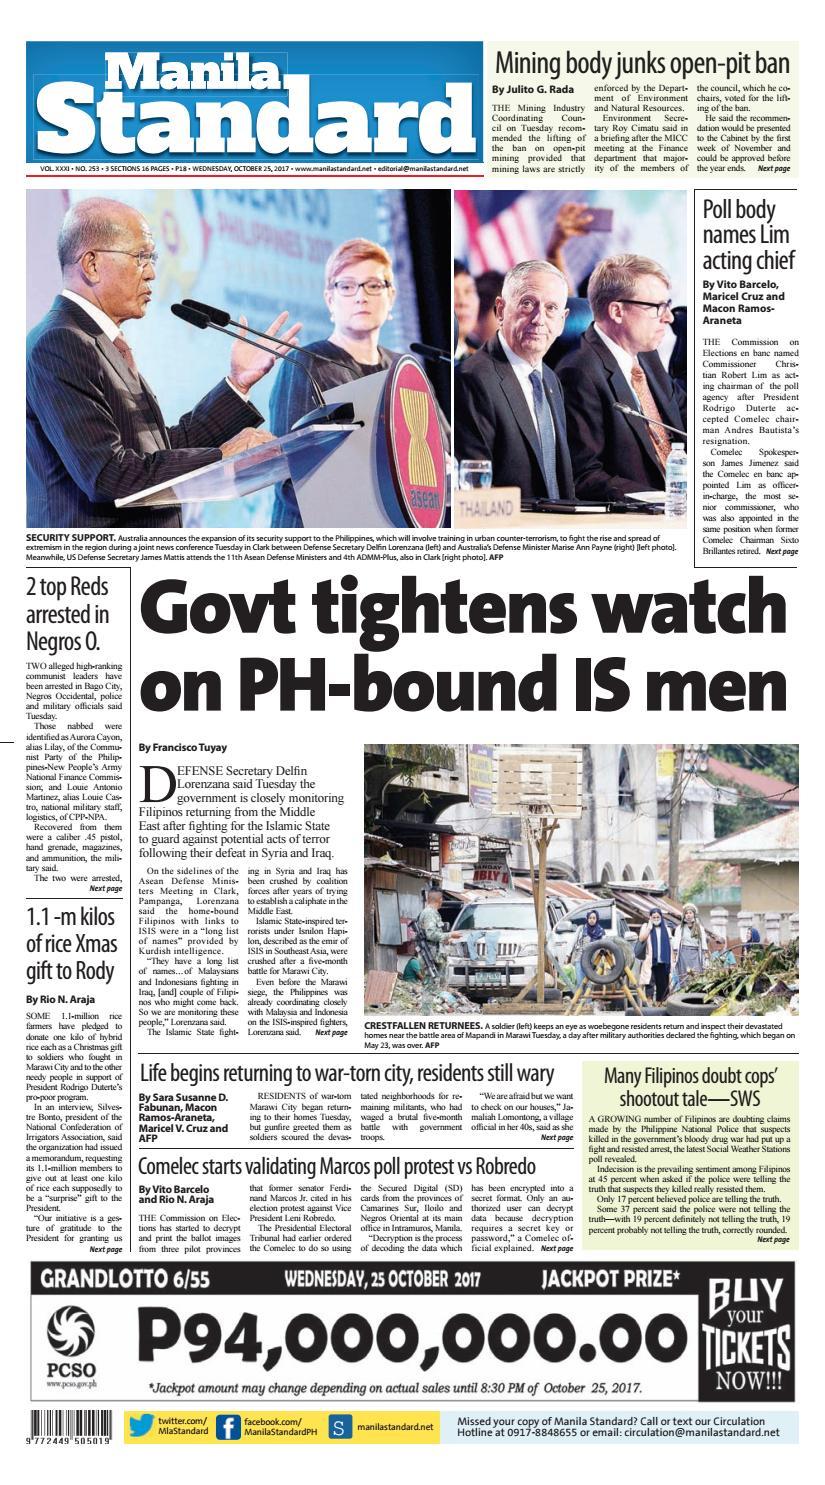 Manila Standard - 2017 October 25 - Wednesday by Manila